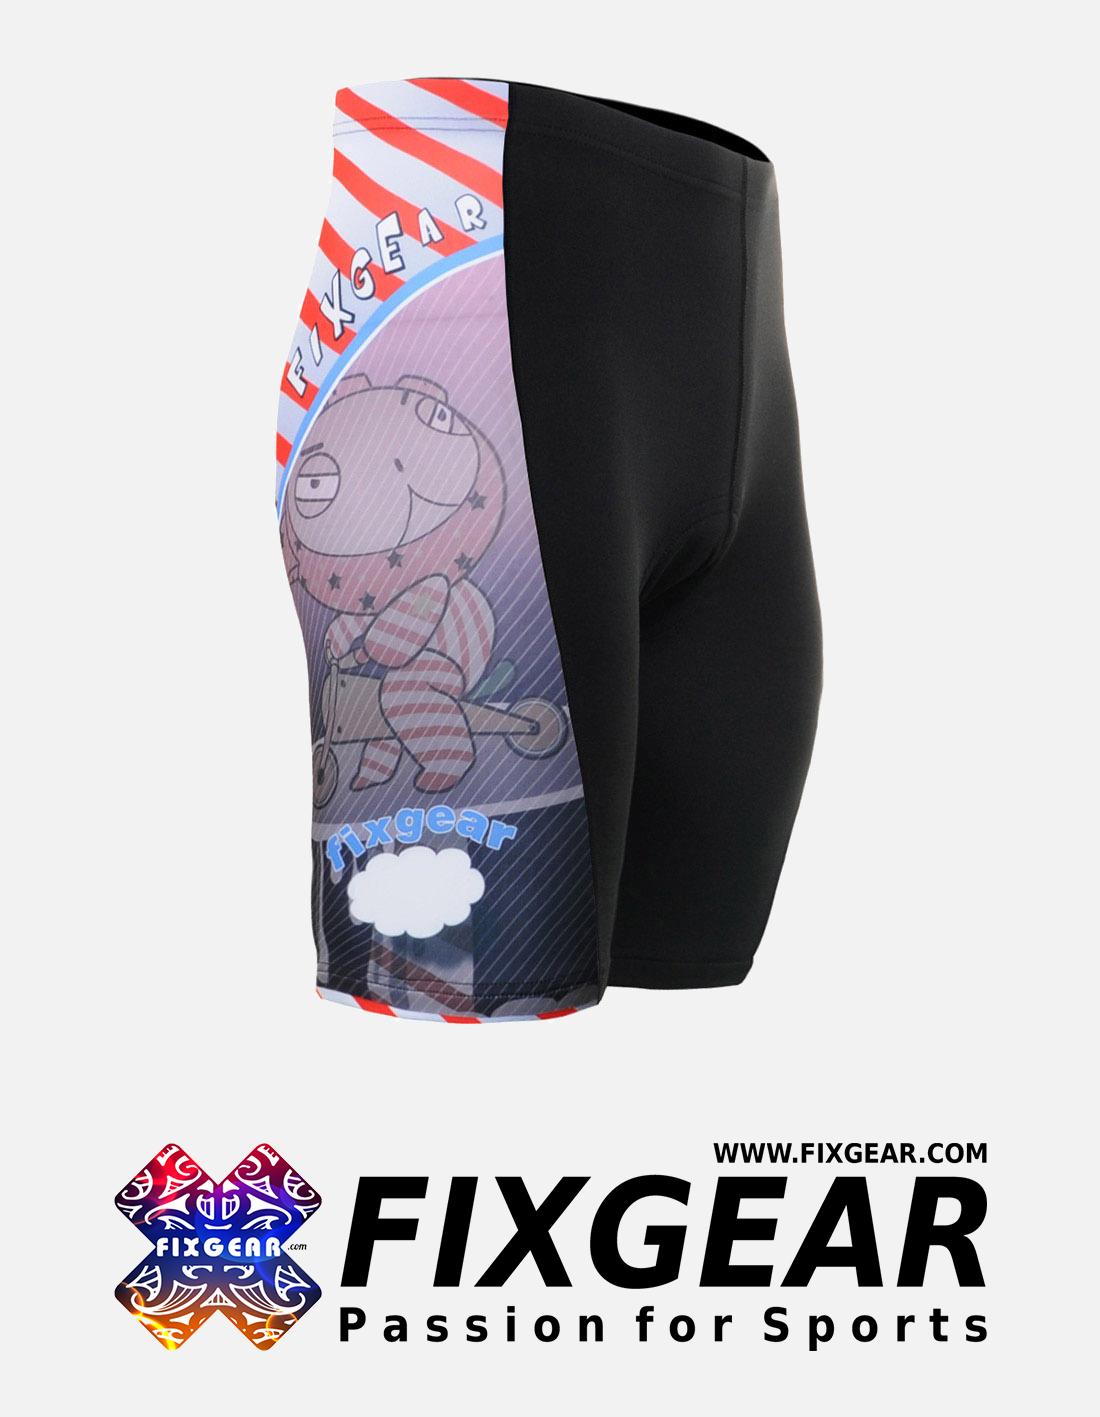 FIXGEAR ST-W16 Women's Cycling Padded Shorts